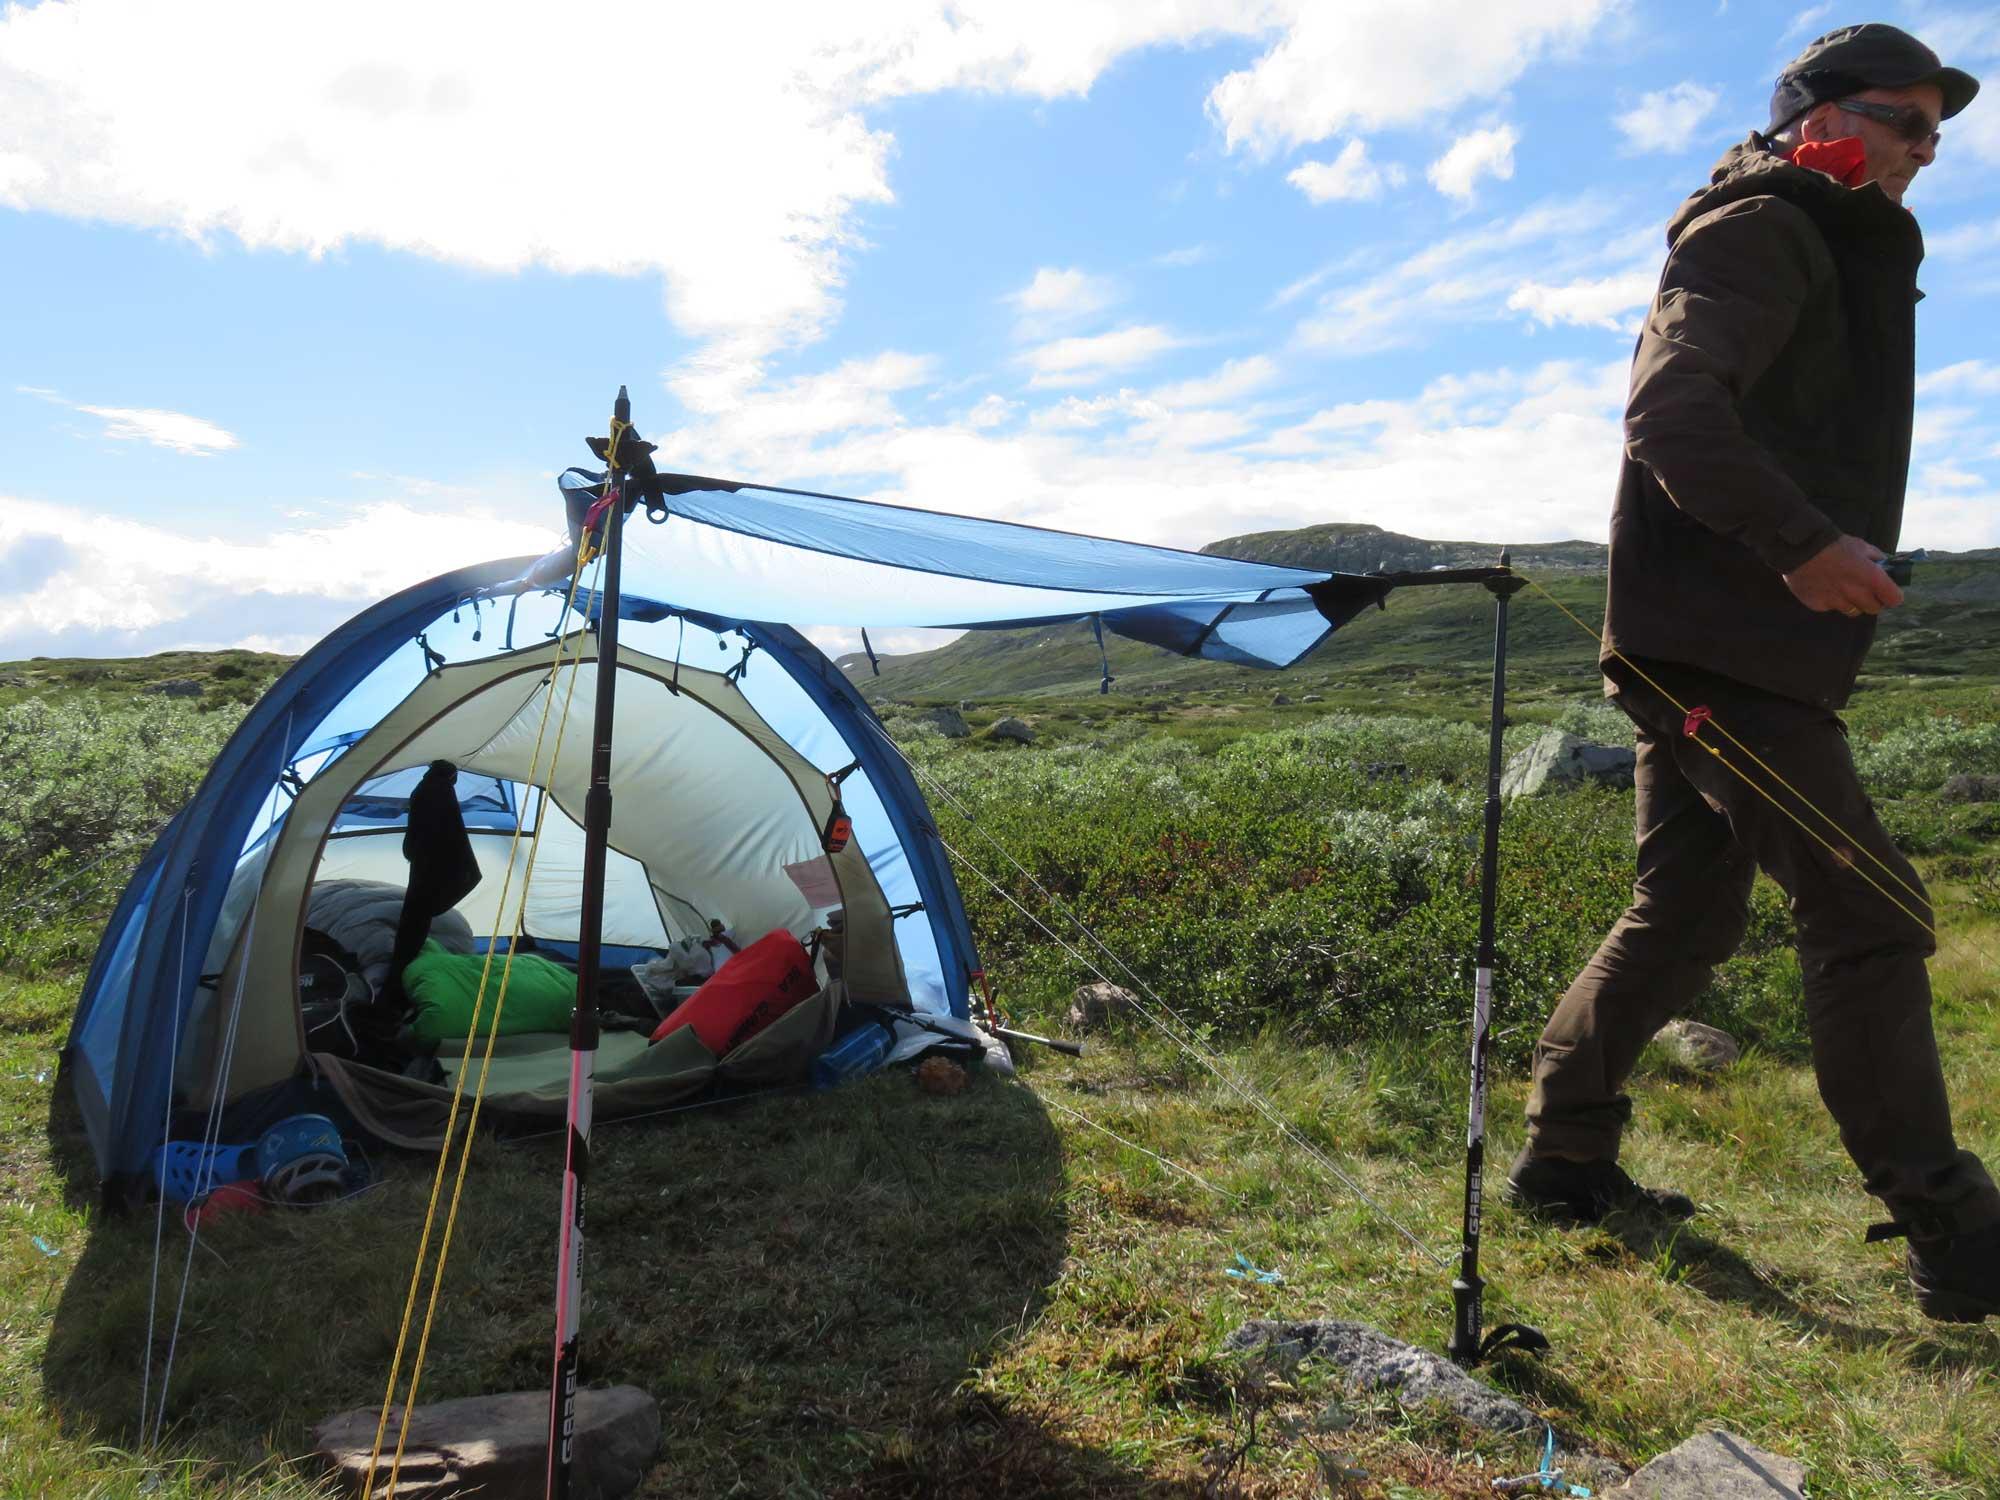 Tiurfot-tester-fjellreven-abisko-lite-3-sqoop-outdoor-Norway